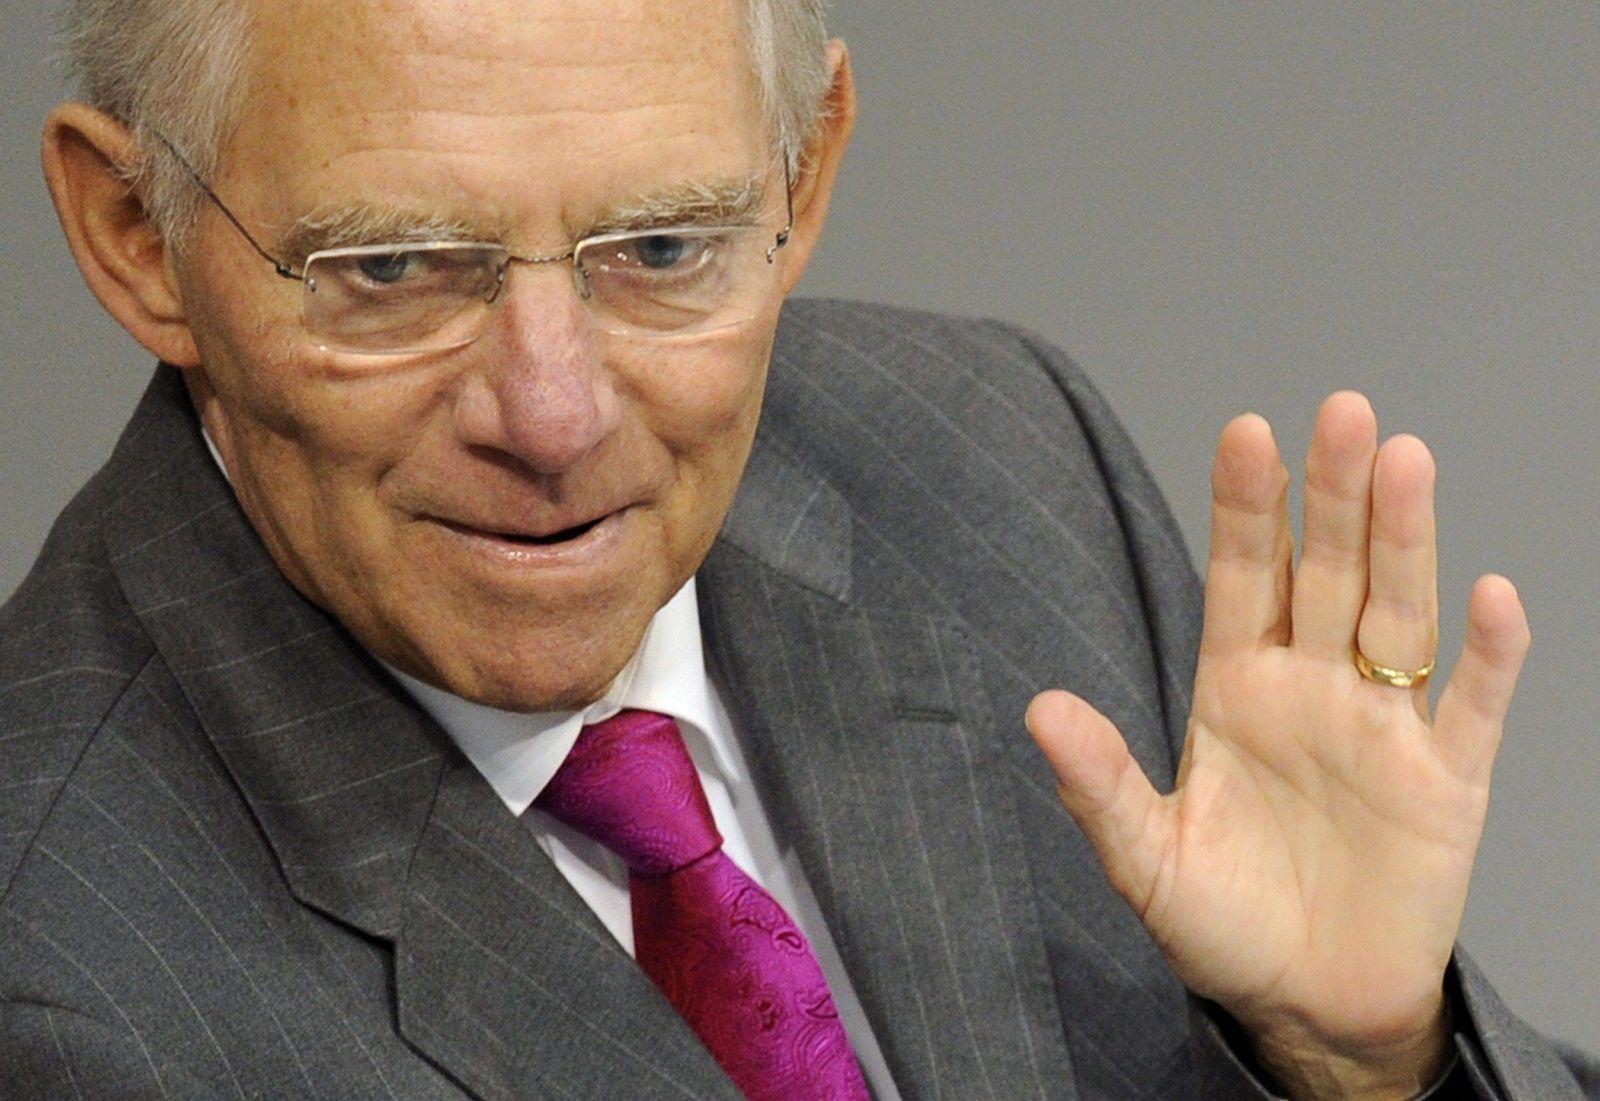 GERMANY-POLITICS-PARLIAMENT-BUDGET-SCHAUEBLE